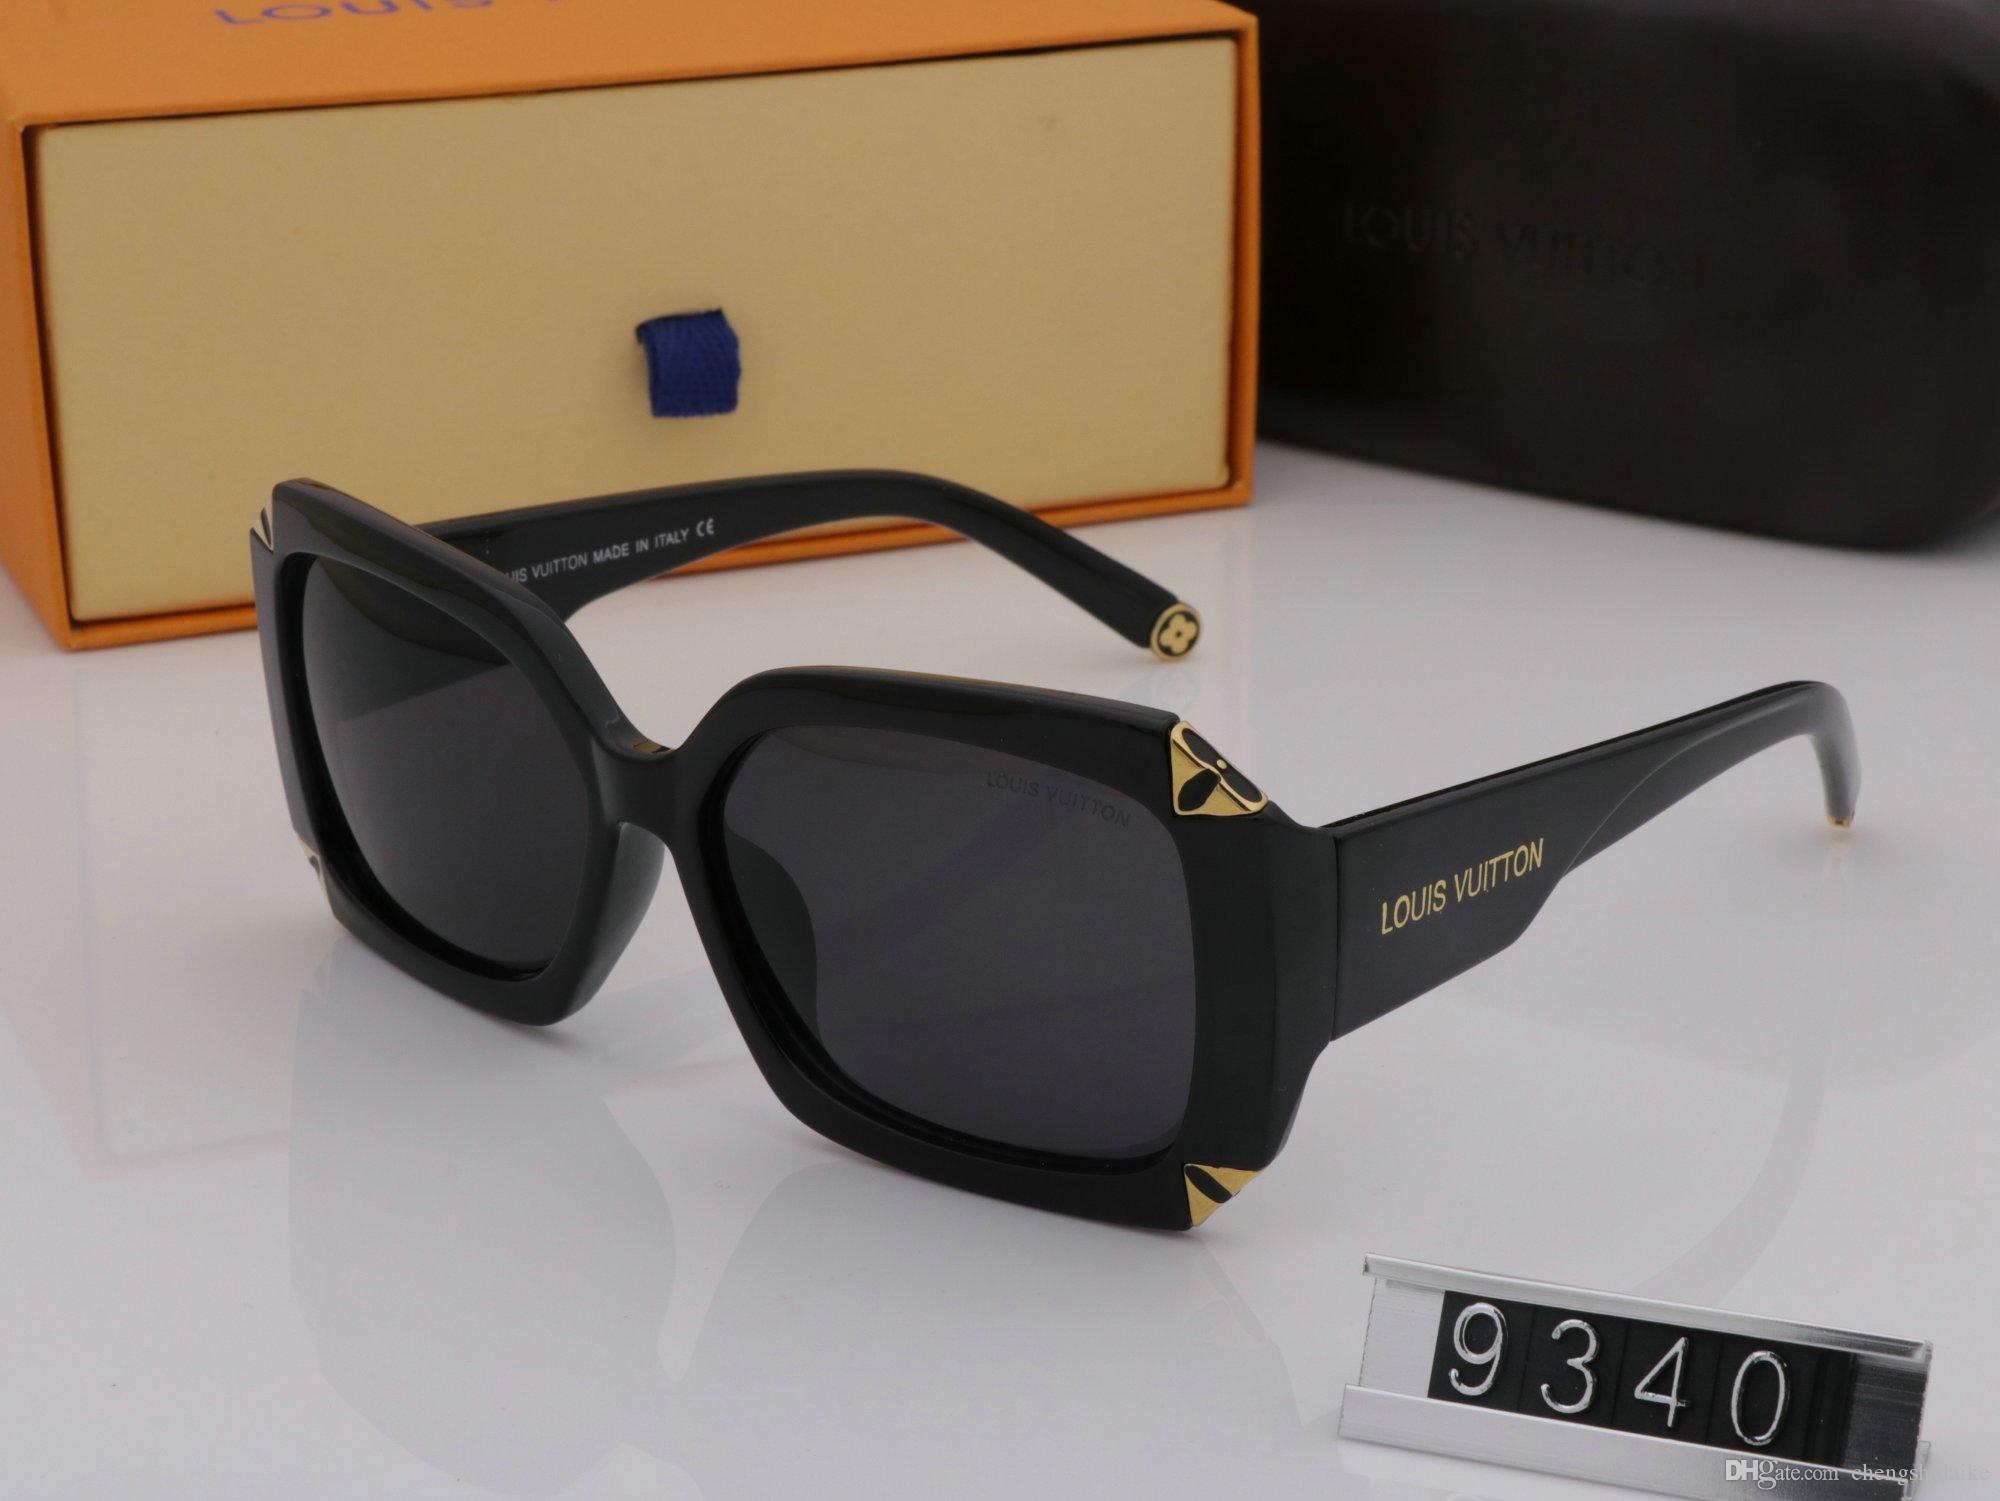 55960db6bb41 Luxury evidence millionaire sunglasses smoke black gold jpg 2000x1501 Louis  vuitton millionaire sunglasses china